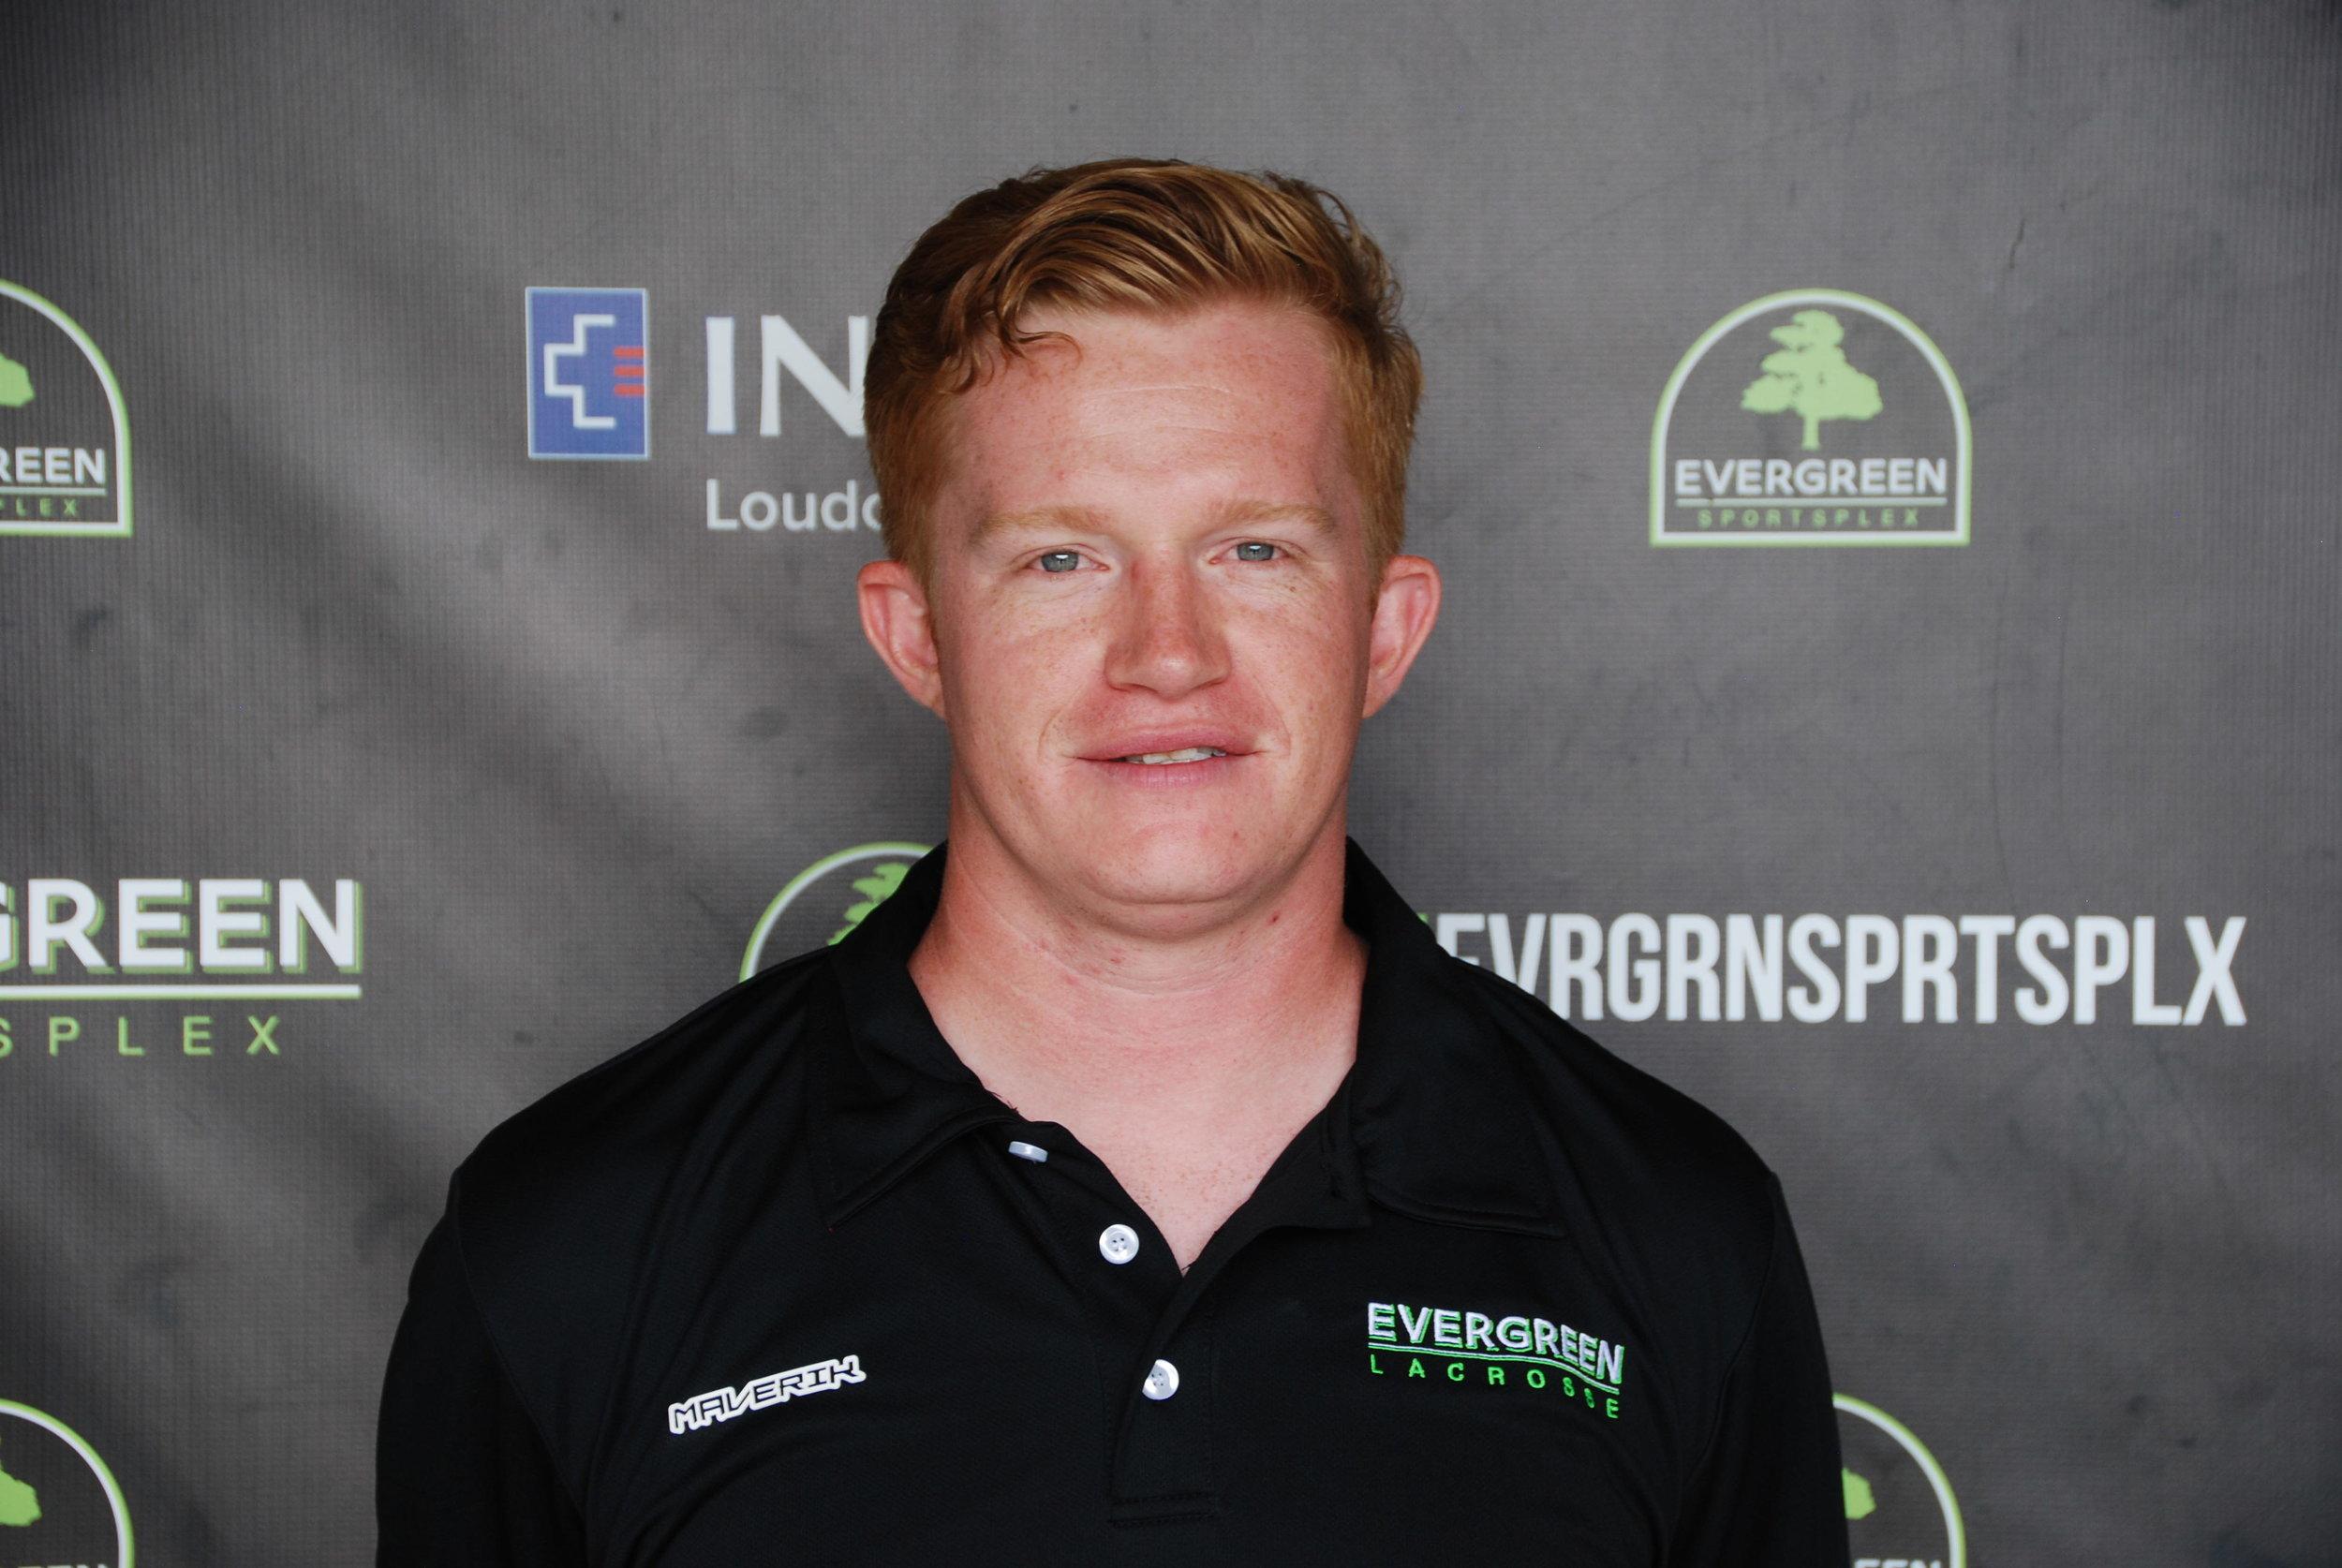 Joey Chrisman, Flint Hill Assistant Coach